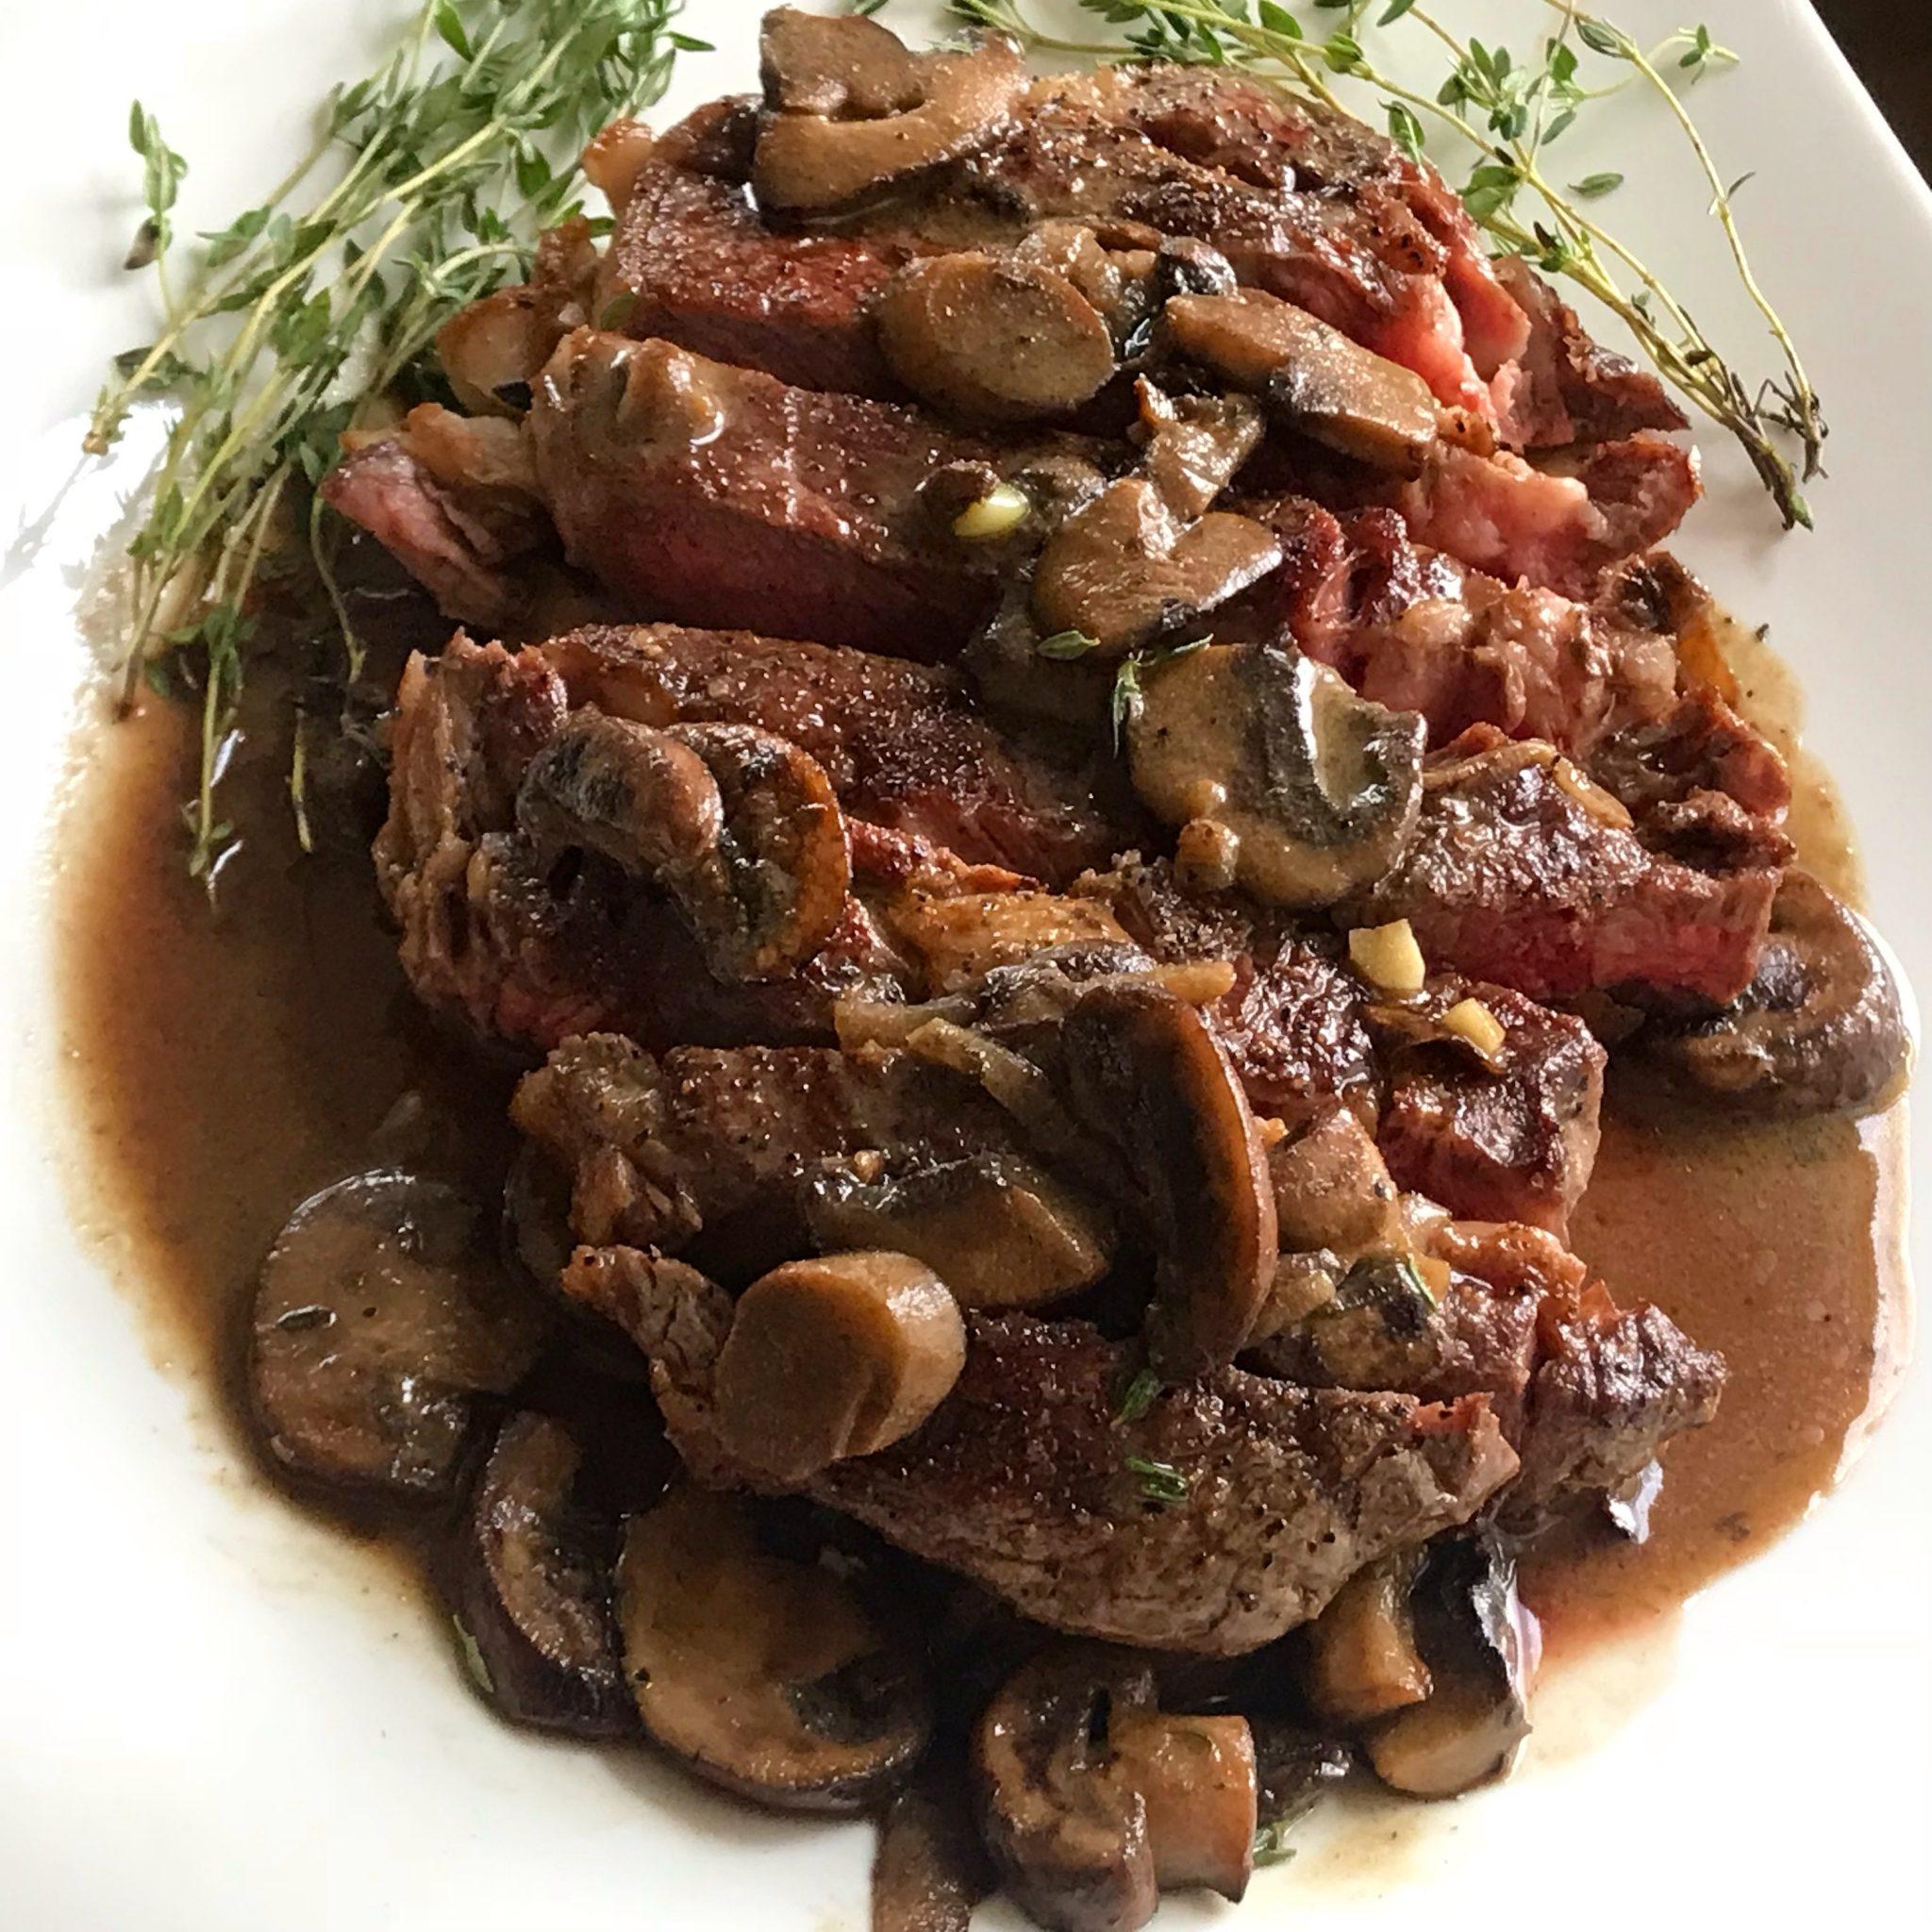 Steak with Mushroom Dijon Sauce